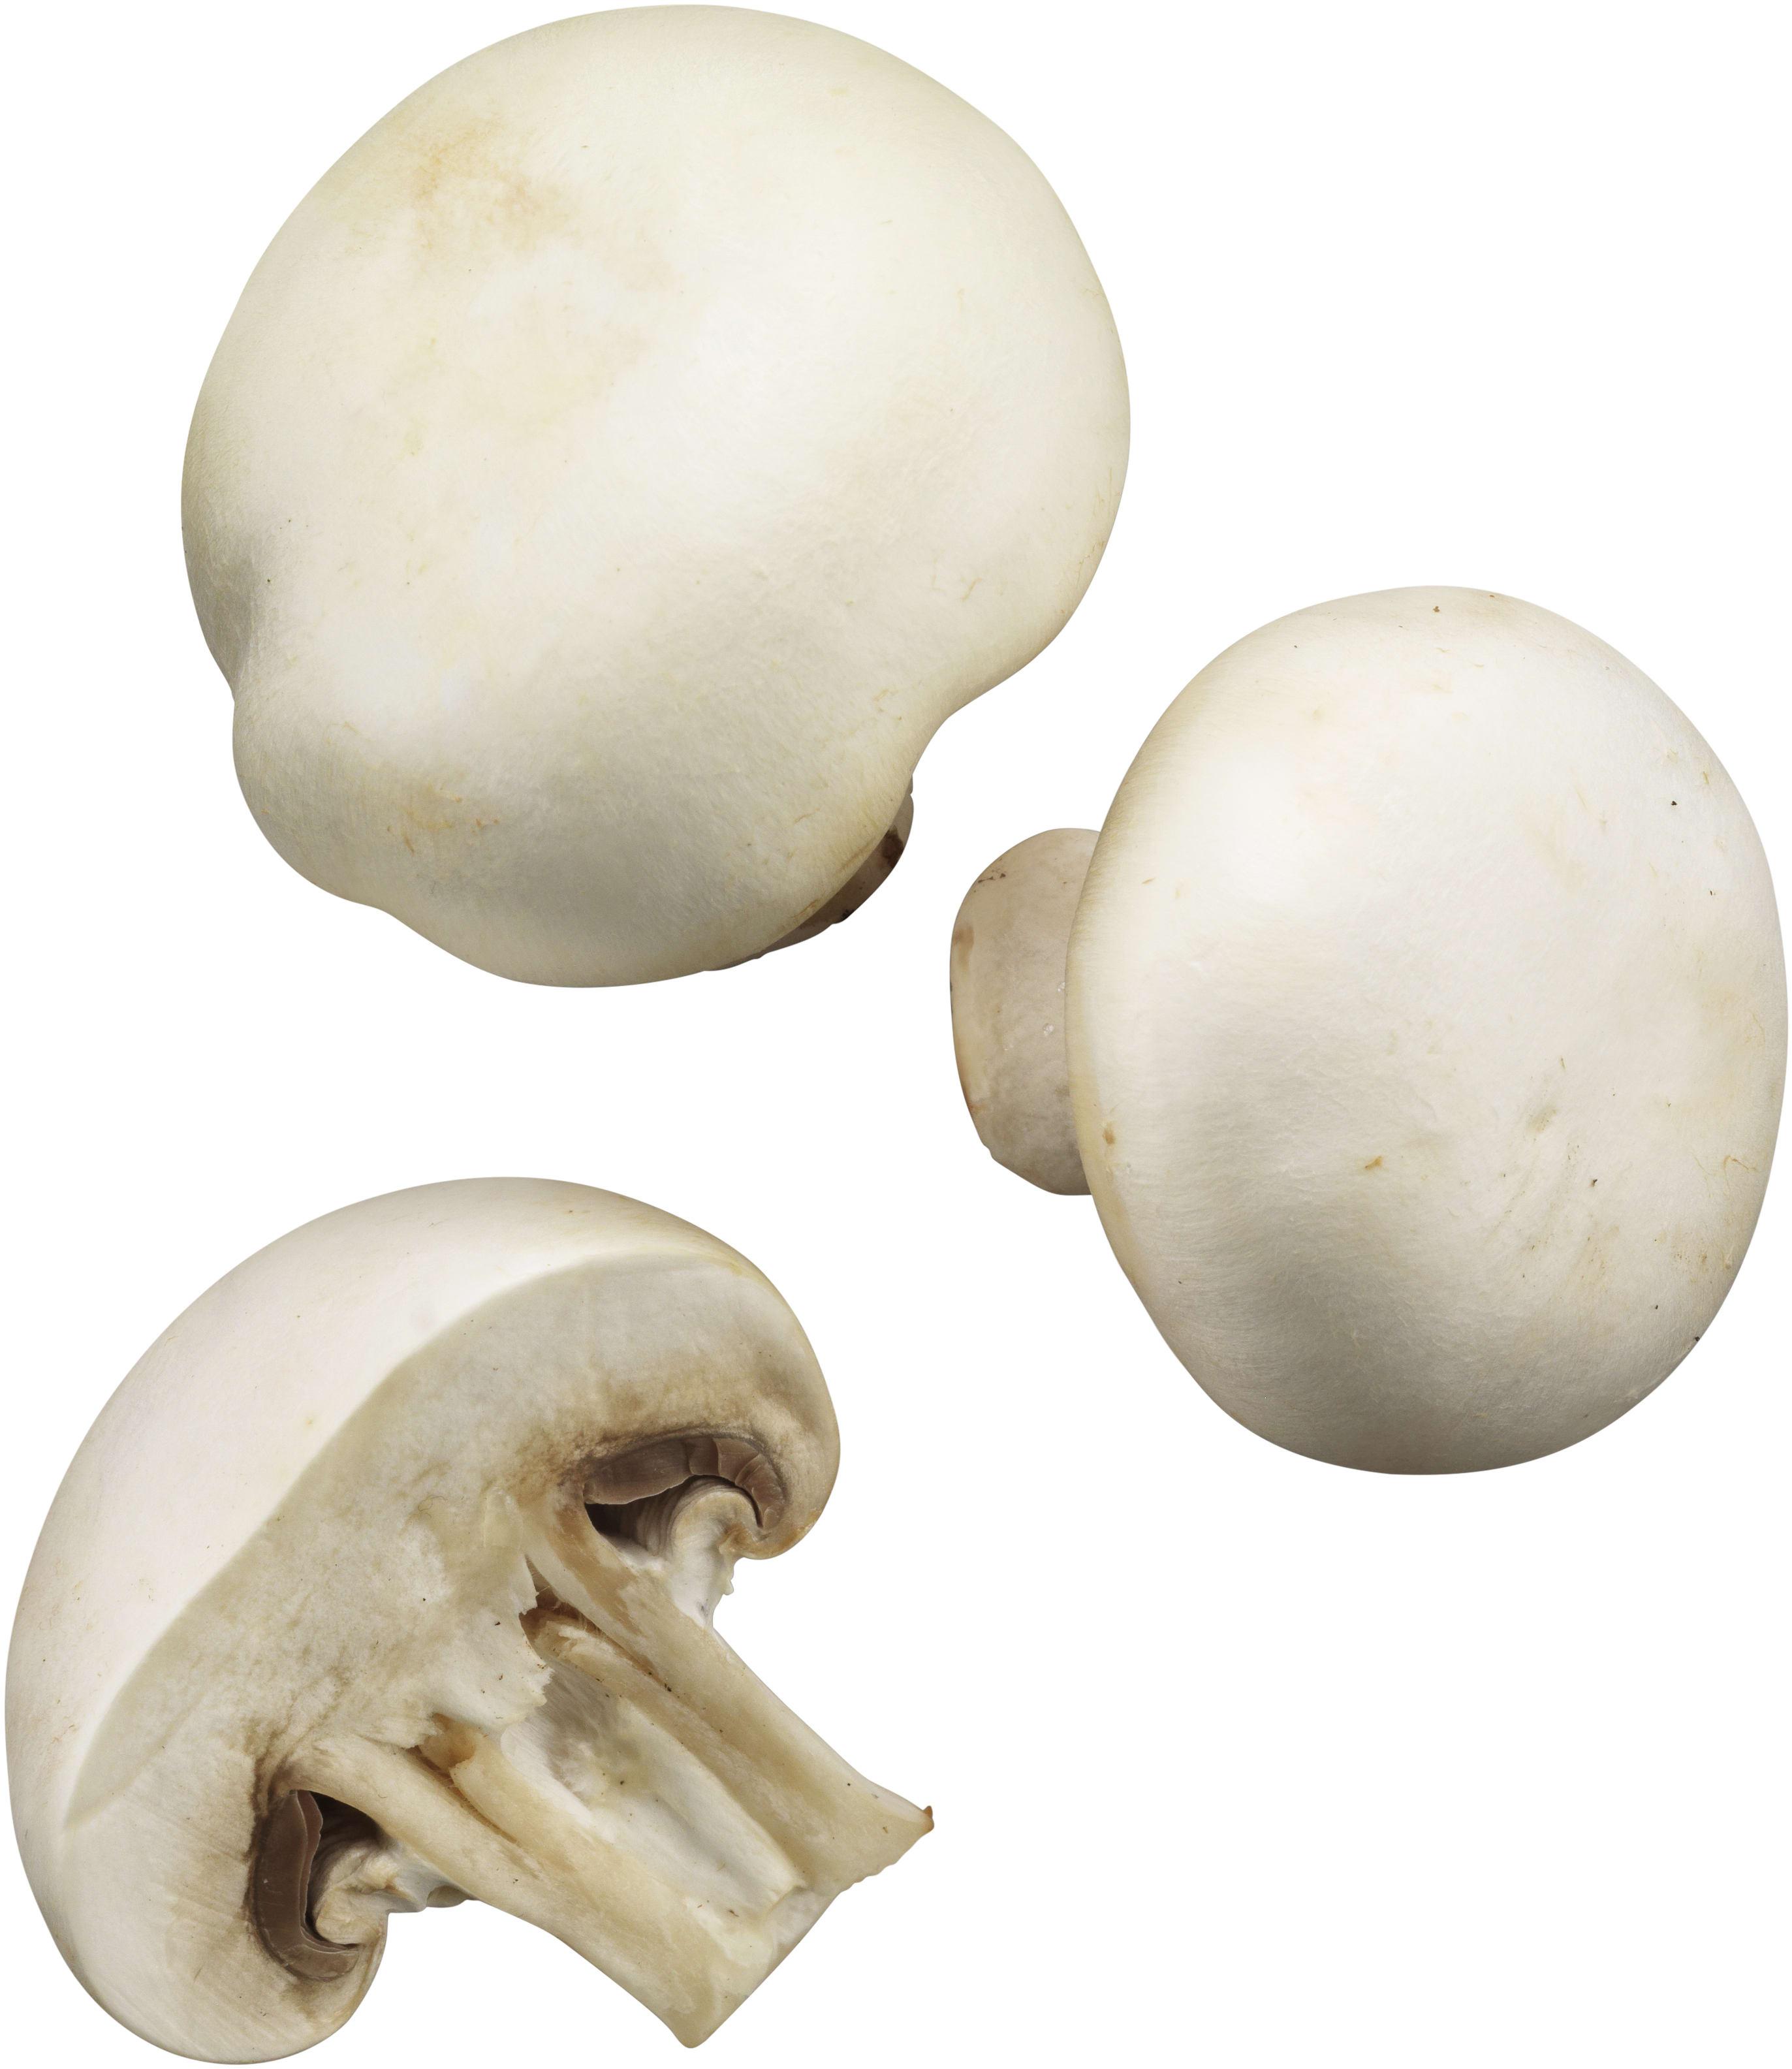 recipe: svampar i gräsmattan bilder [39]